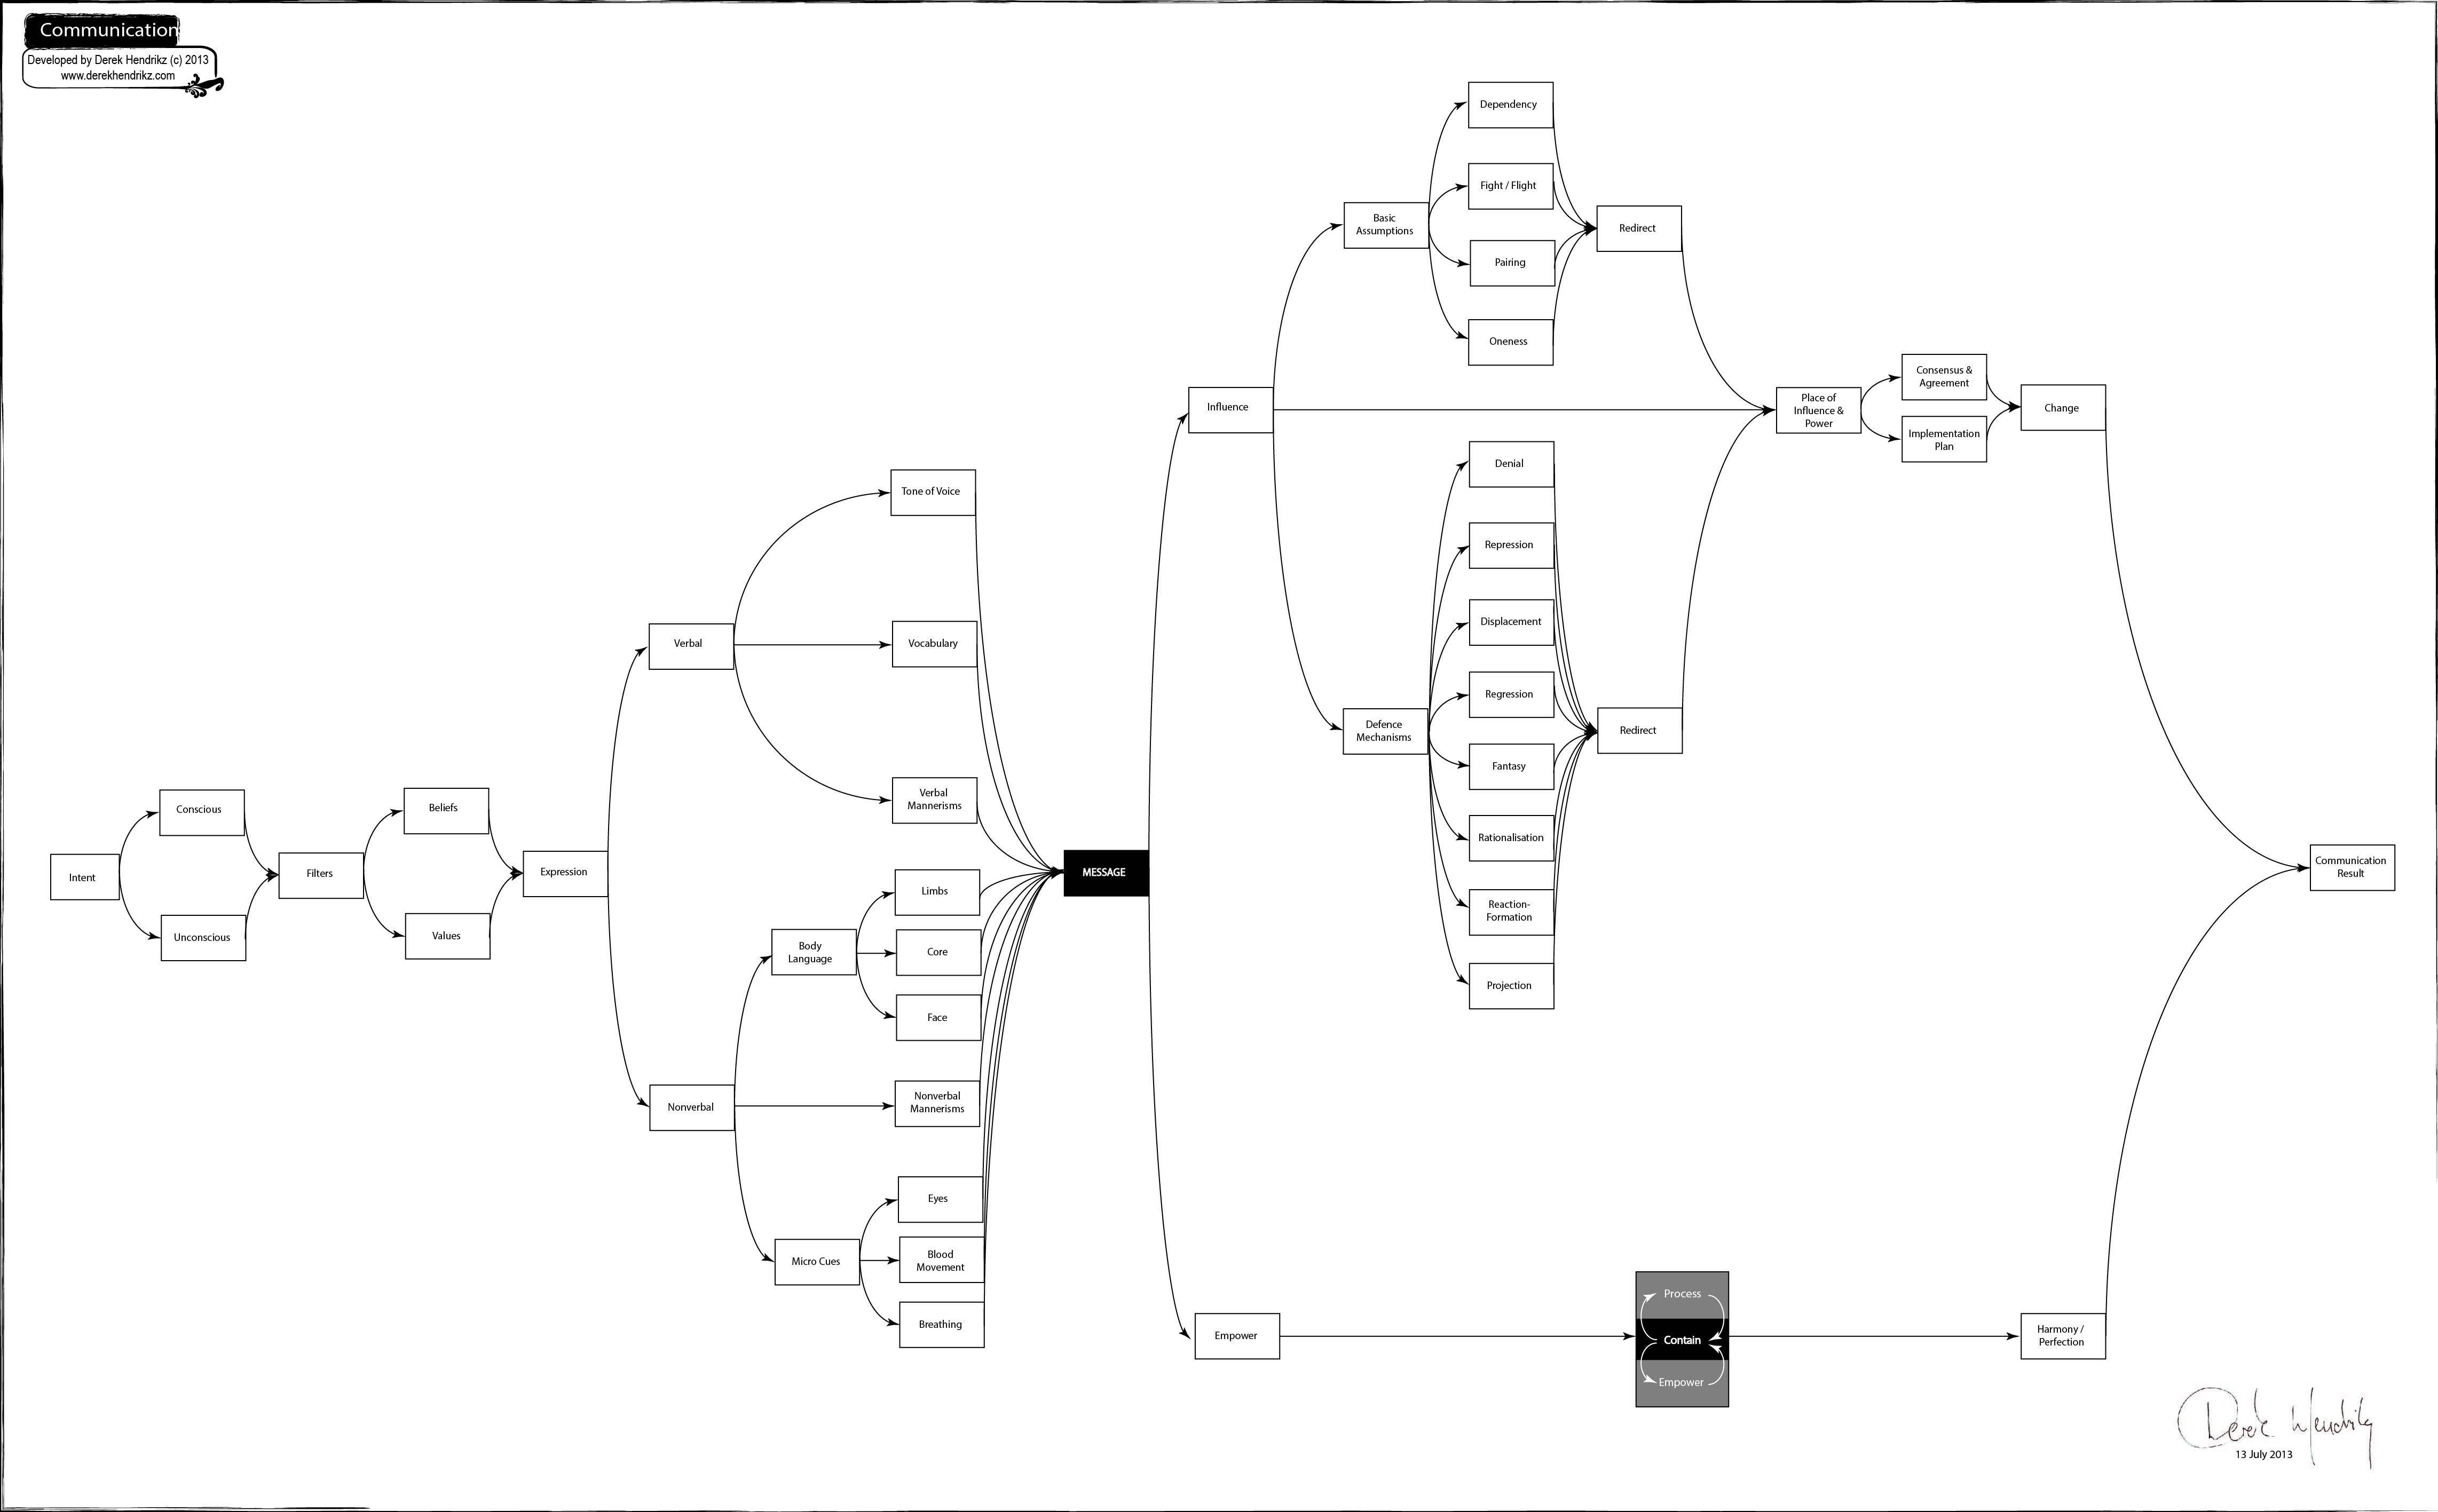 39 Stunning Contract Management Process Diagram Design